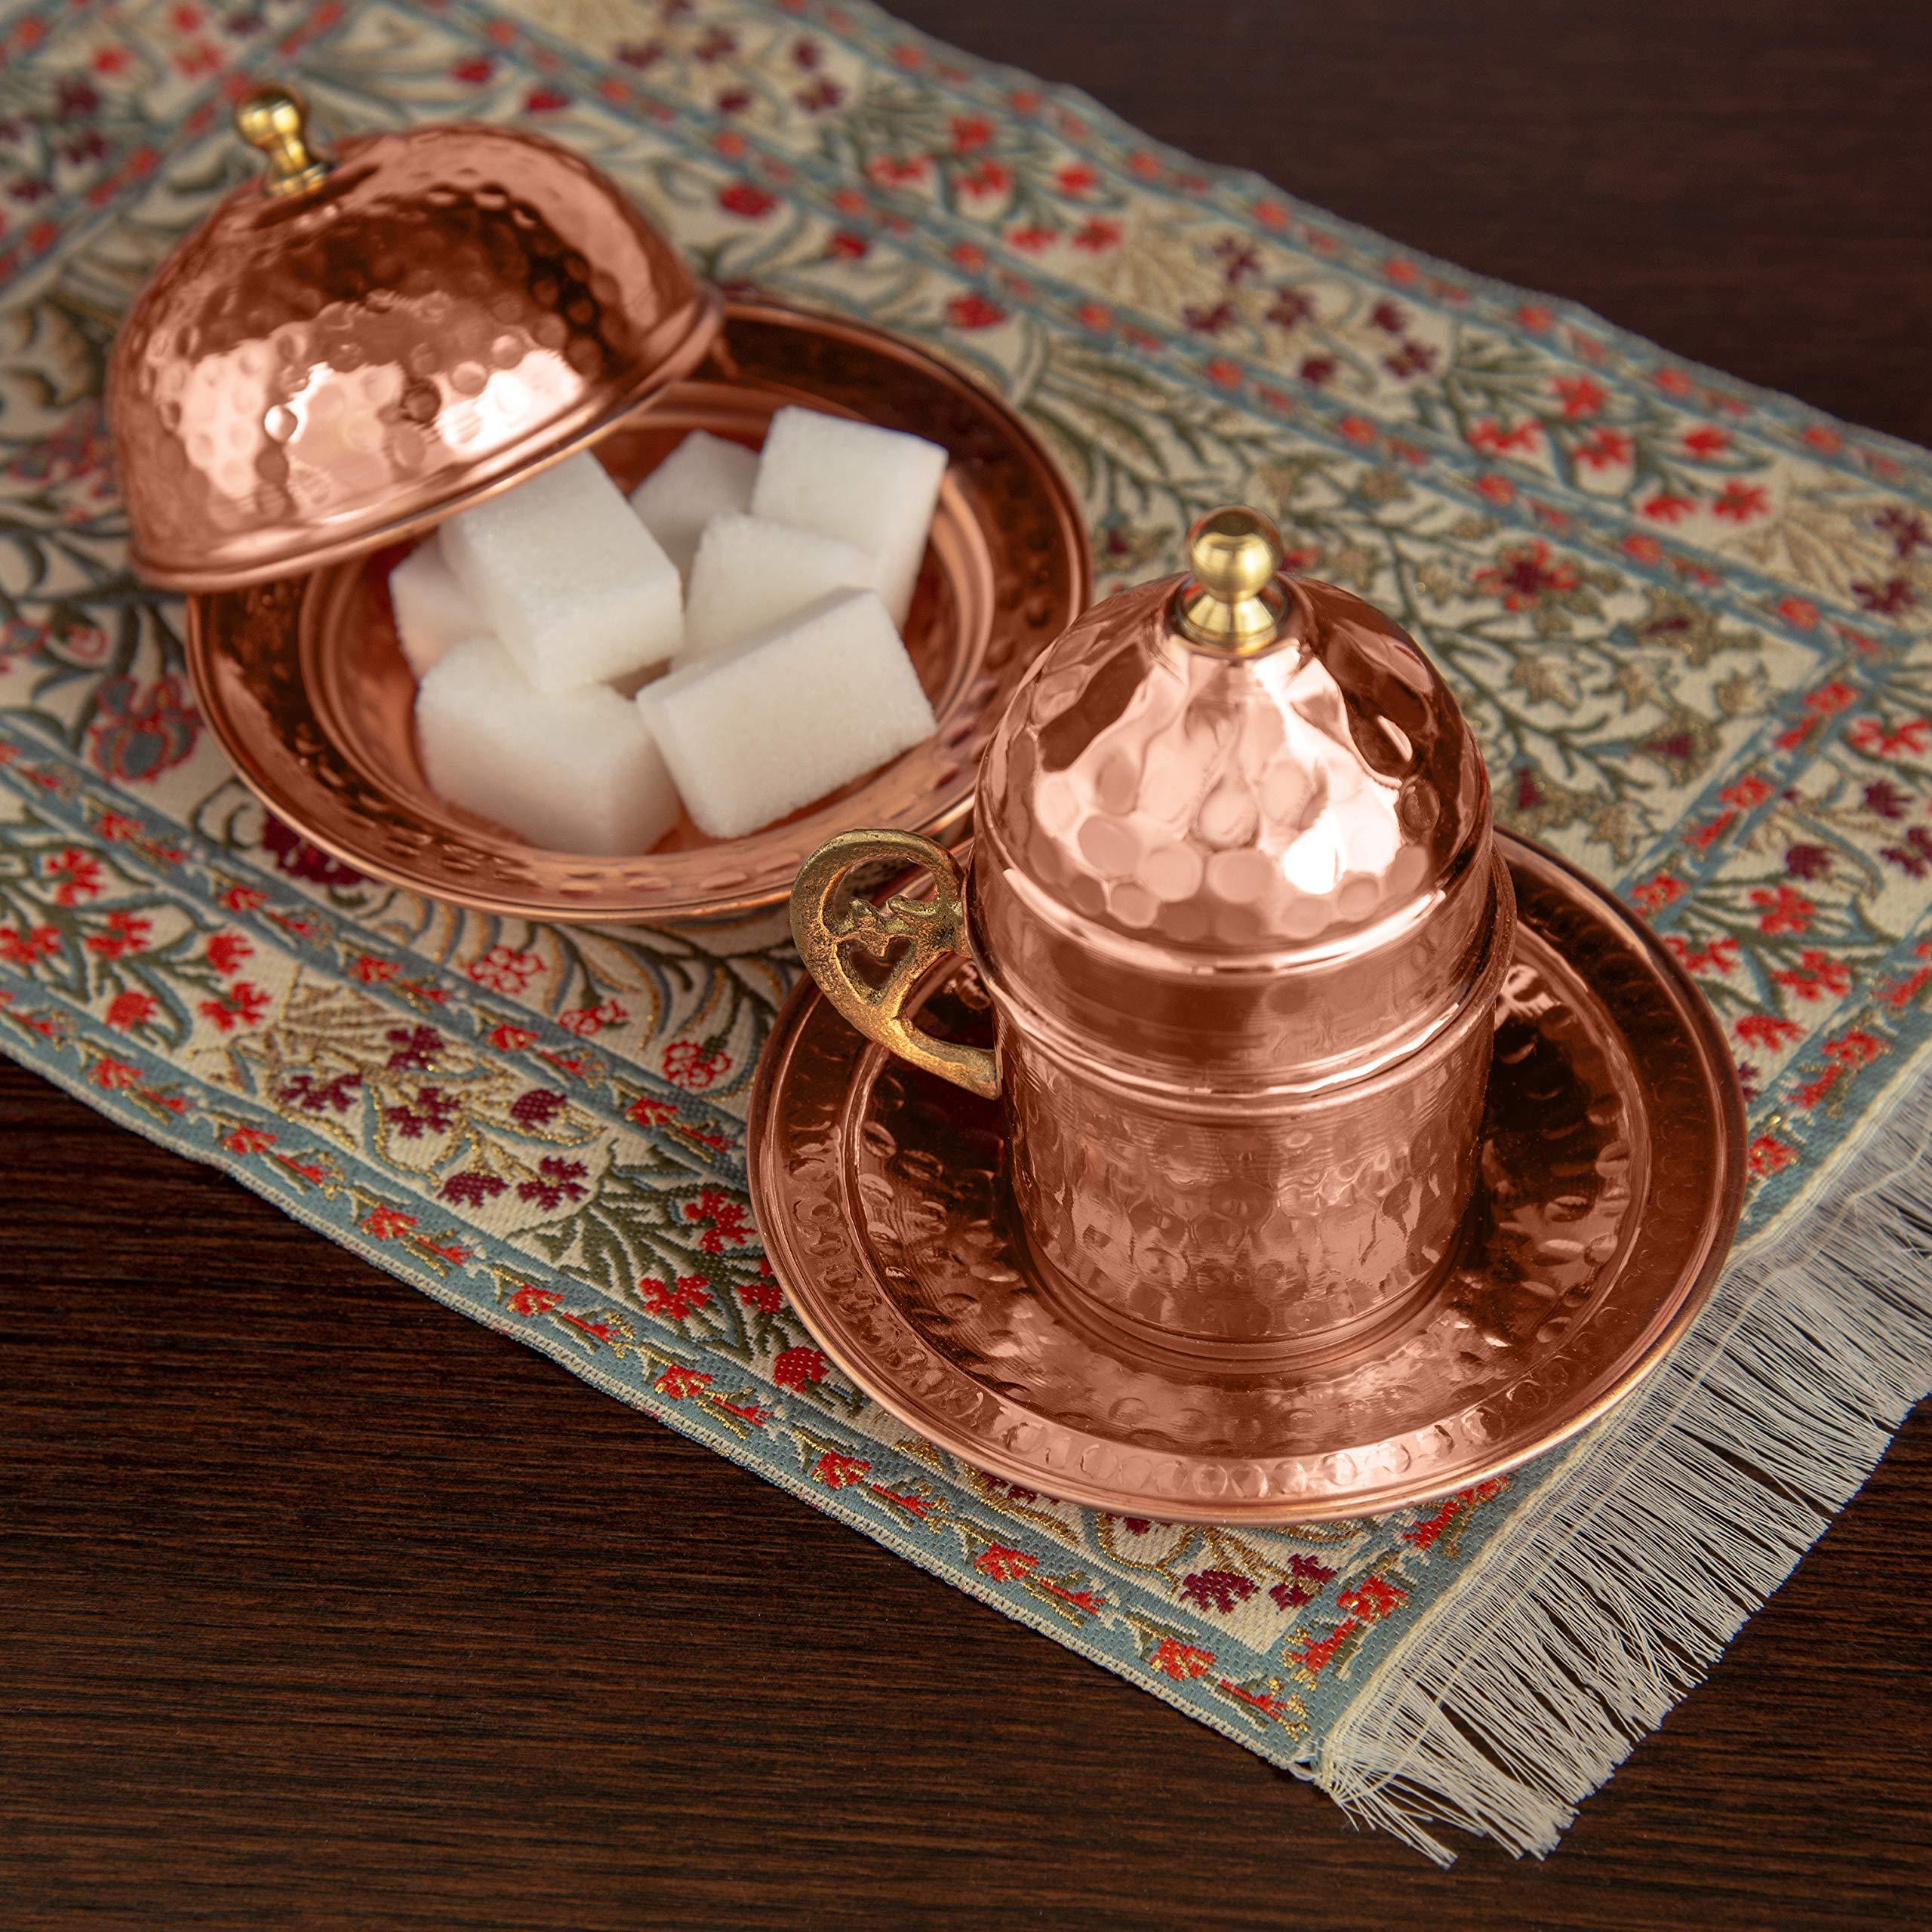 Copper Turkish Coffee Set, Two, Greek Armenian Arabic Espresso Porcelain Cups, Tray & Cezve by Mandalina Magic by Mandalina Magic (Image #9)